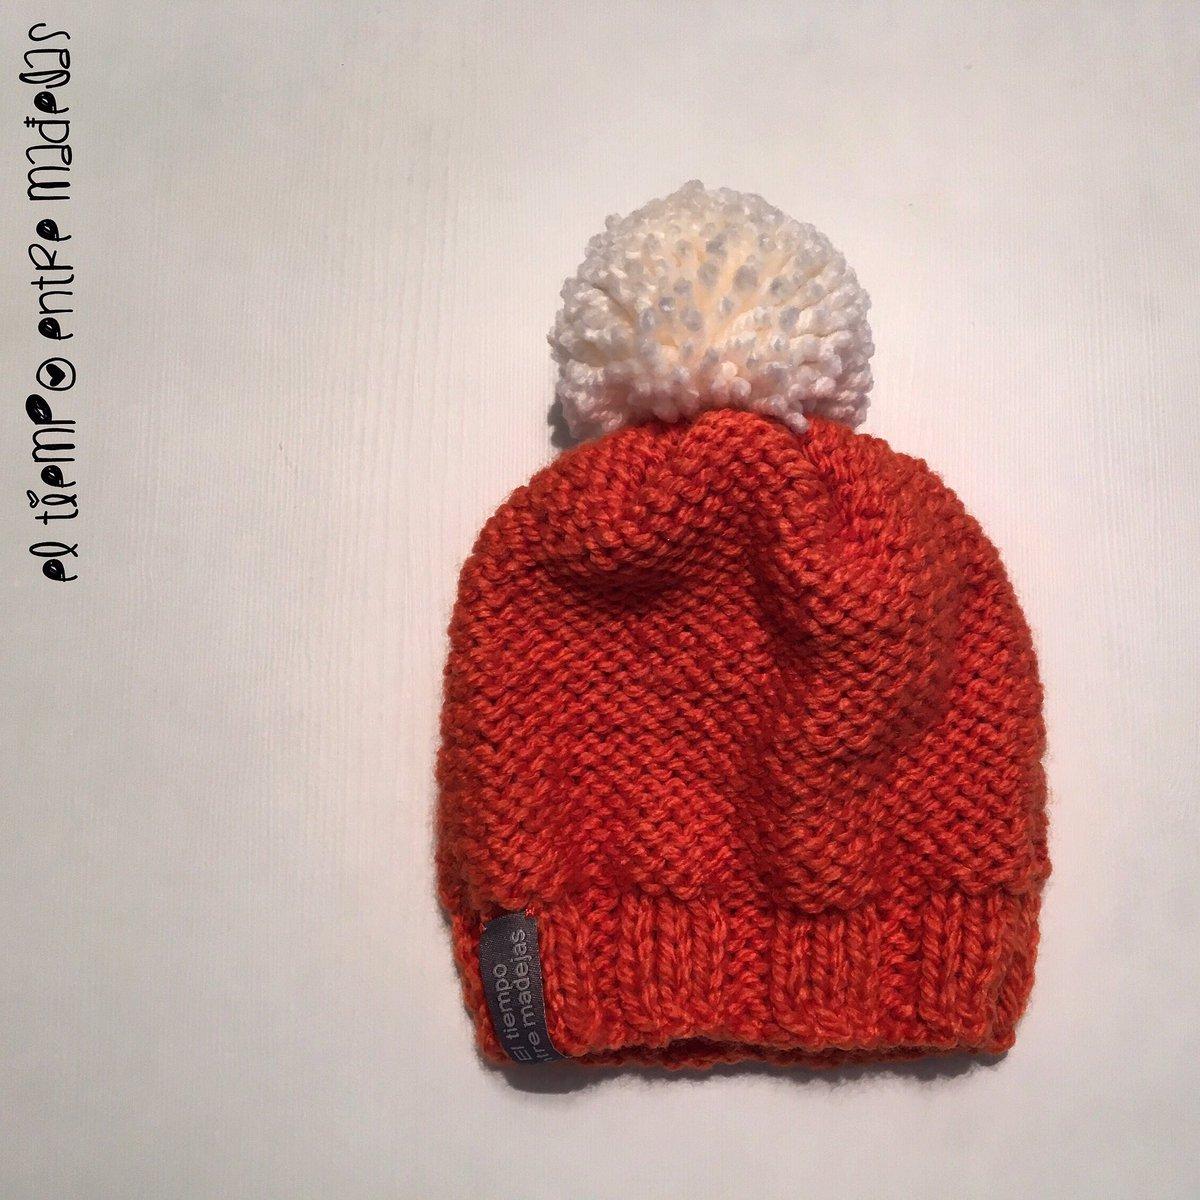 orange is the new black gorro hay bonnet lana wool